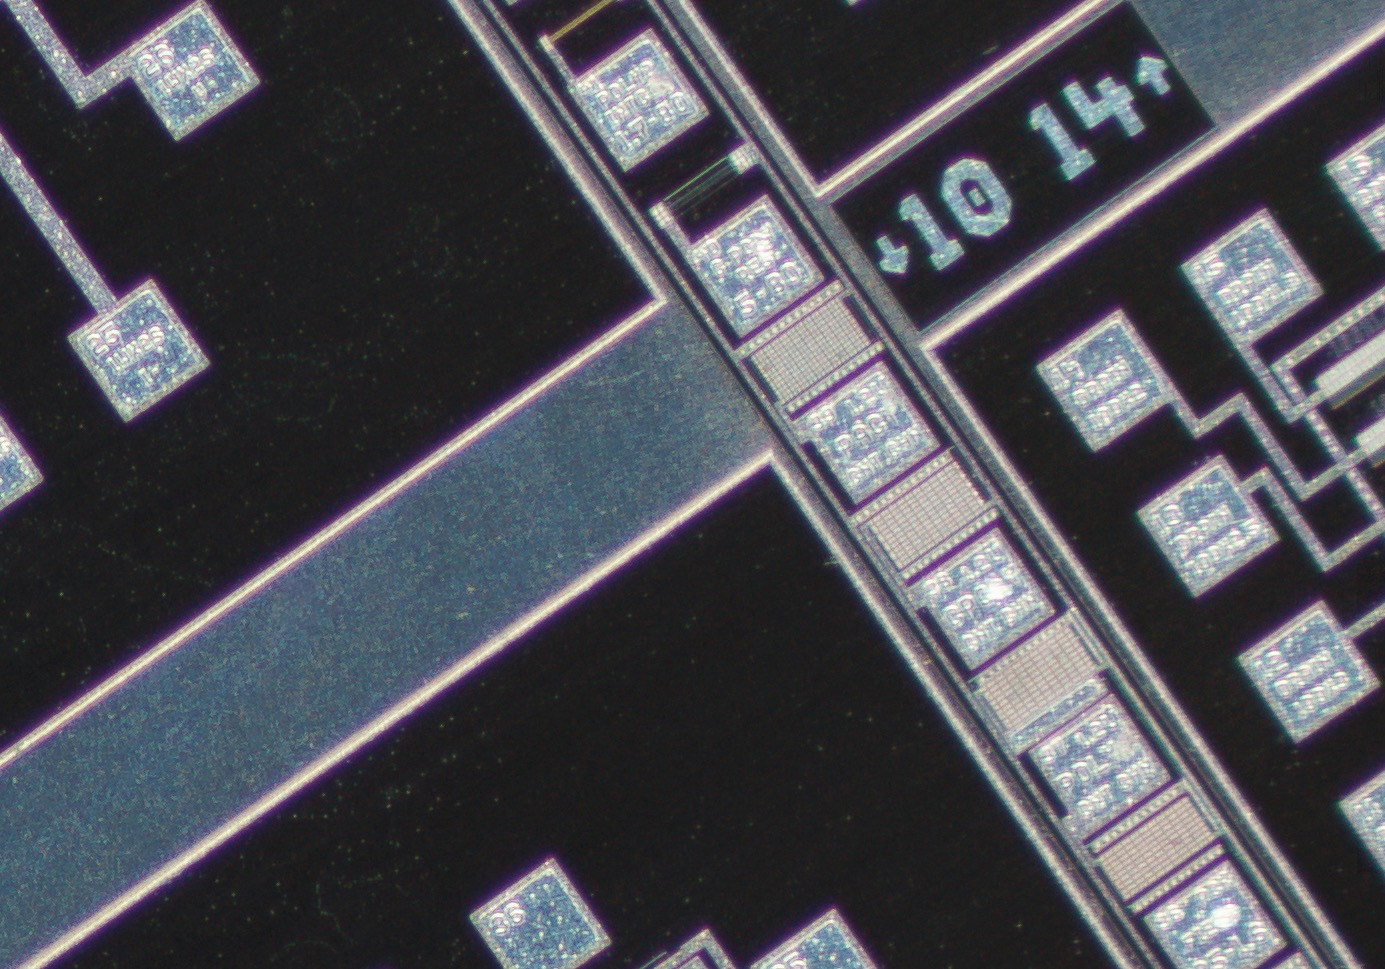 Nikon CFI Plan Achro 4X Gold Barrel corner crop at 100% actual pixel view.Clicking on an image will open a larger version.